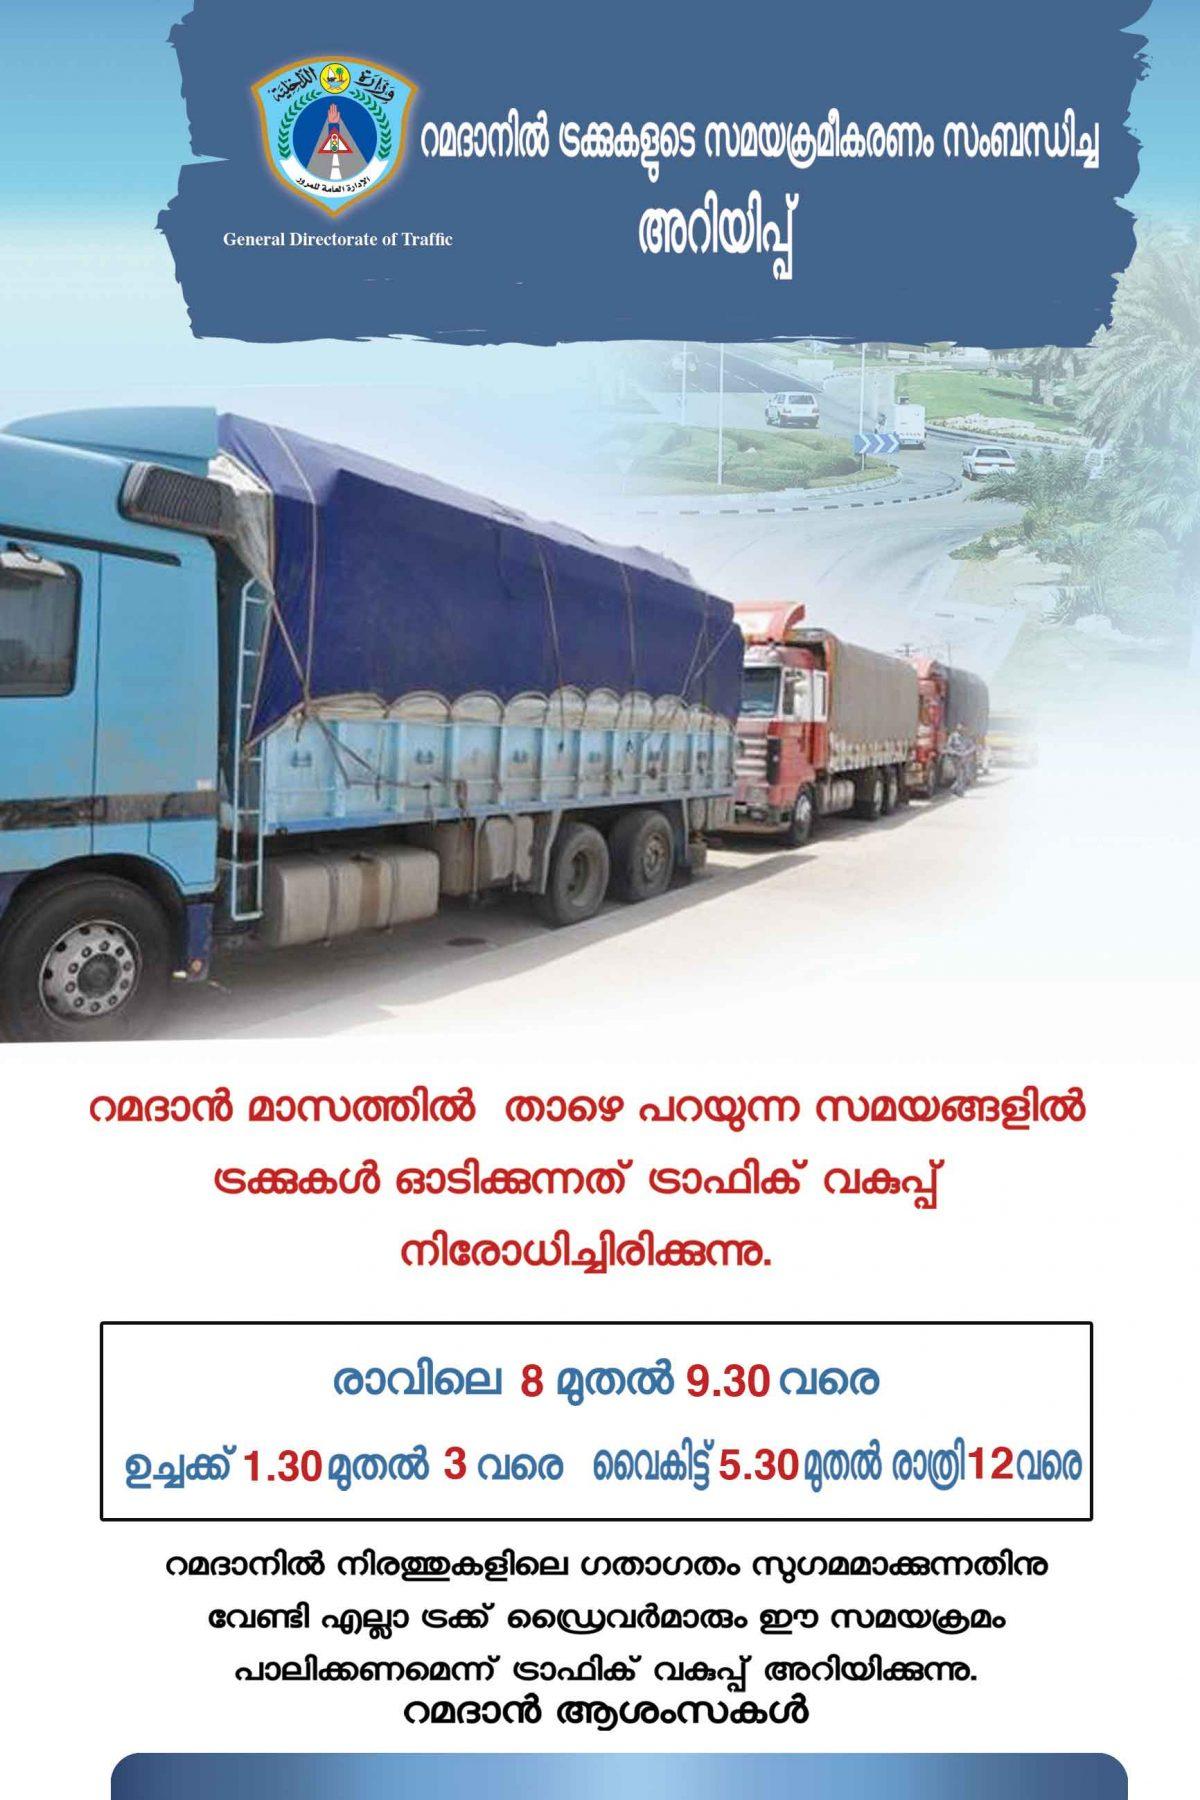 Announcement on Truck Timing during Ramadan | Qatar Chamber